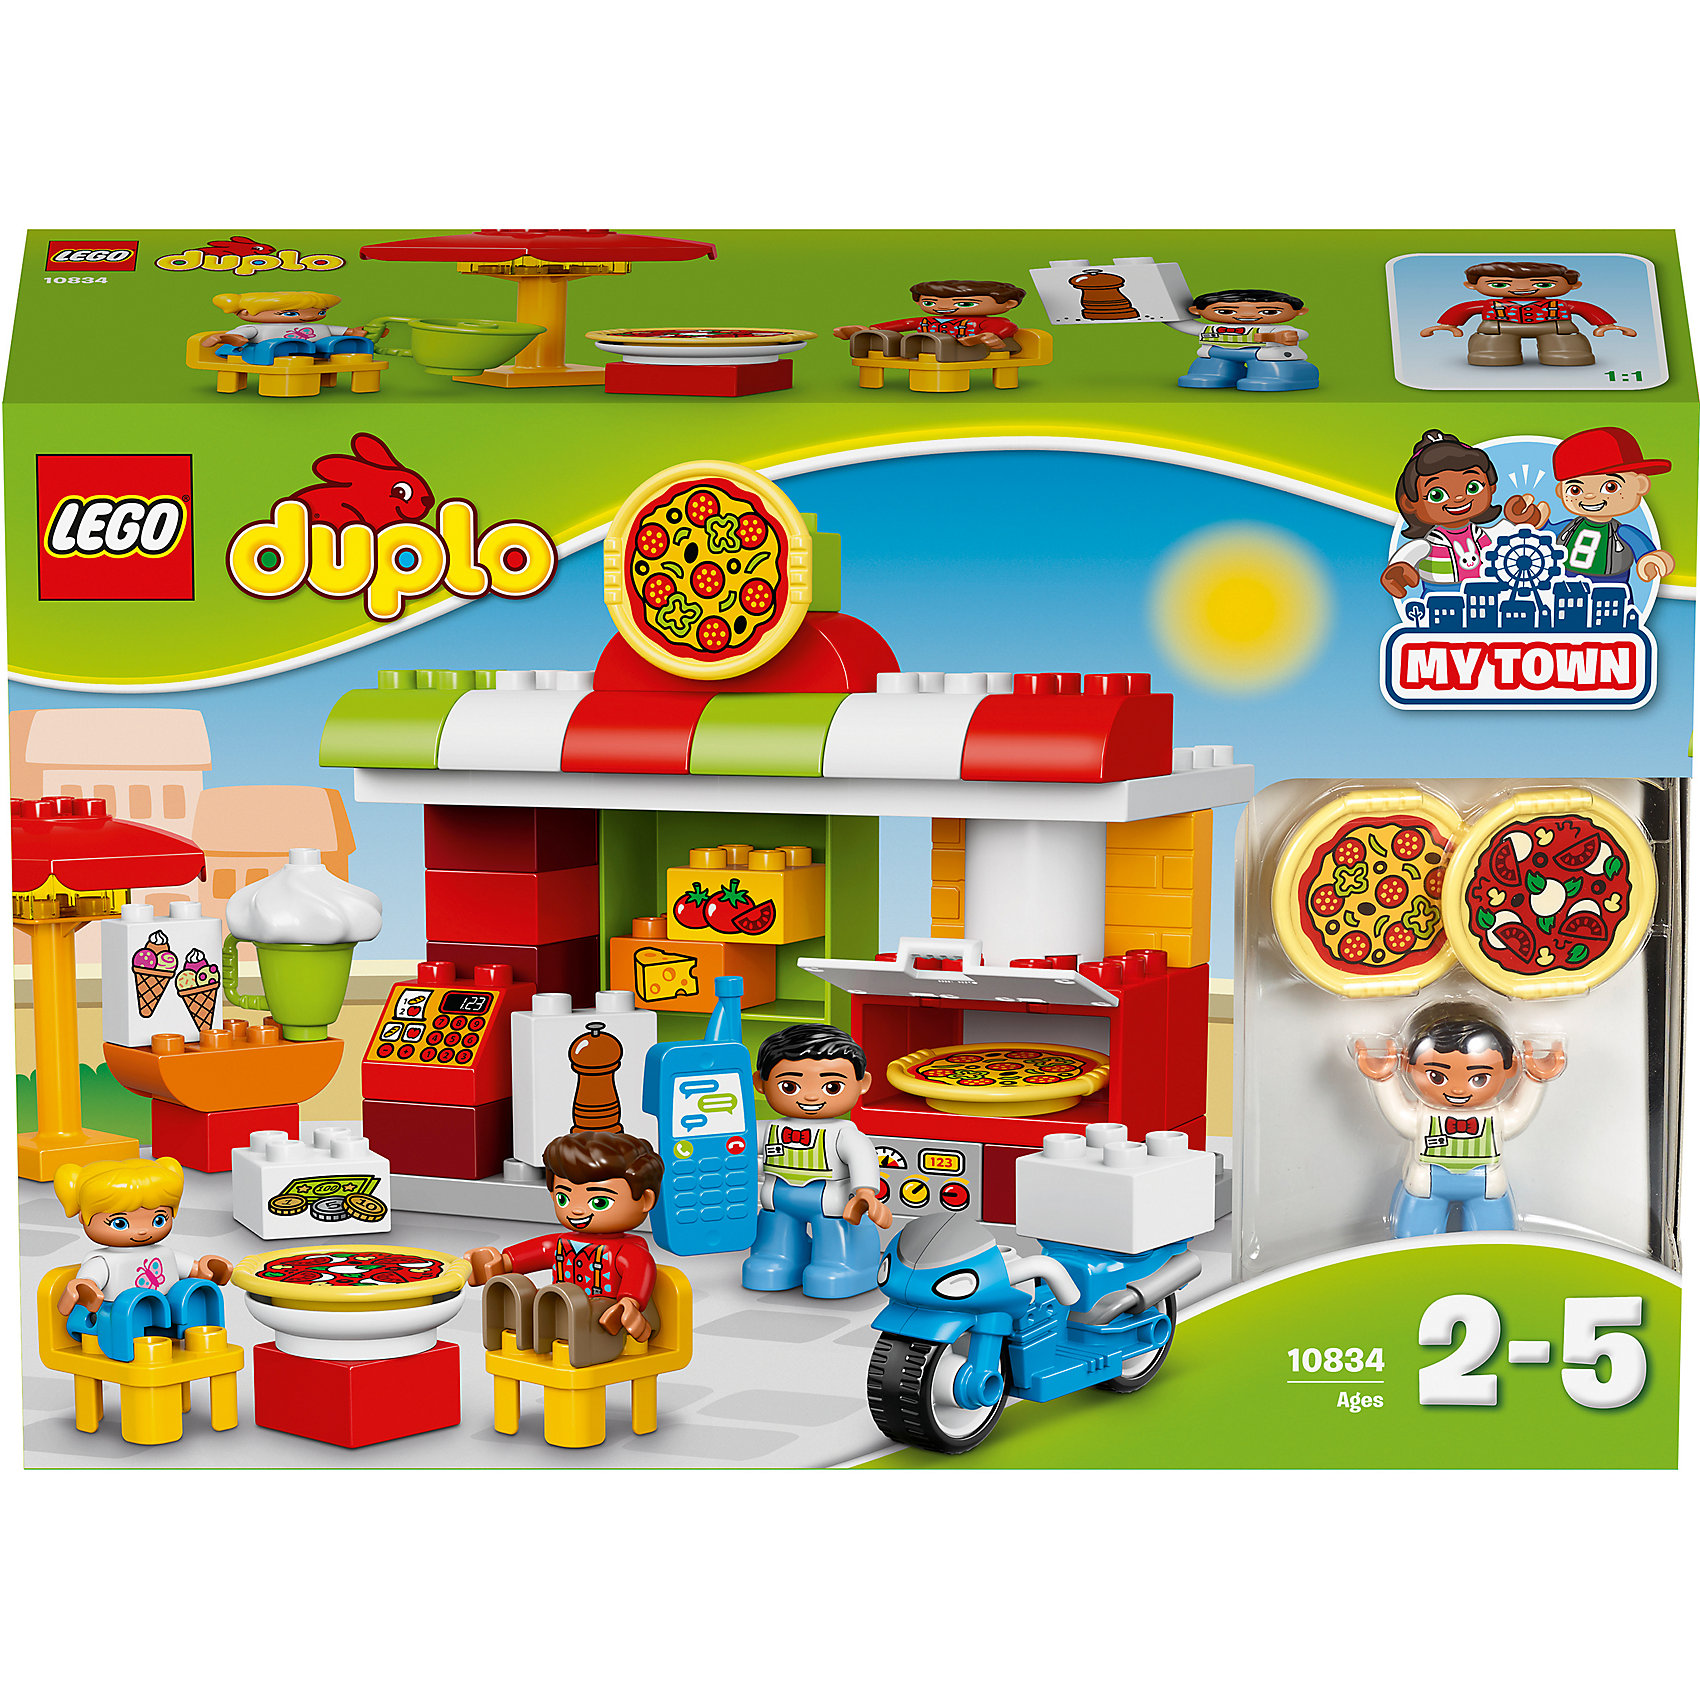 LEGO DUPLO 10834: Пиццерия<br><br>Ширина мм: 382<br>Глубина мм: 118<br>Высота мм: 262<br>Вес г: 892<br>Возраст от месяцев: 24<br>Возраст до месяцев: 60<br>Пол: Унисекс<br>Возраст: Детский<br>SKU: 5002520